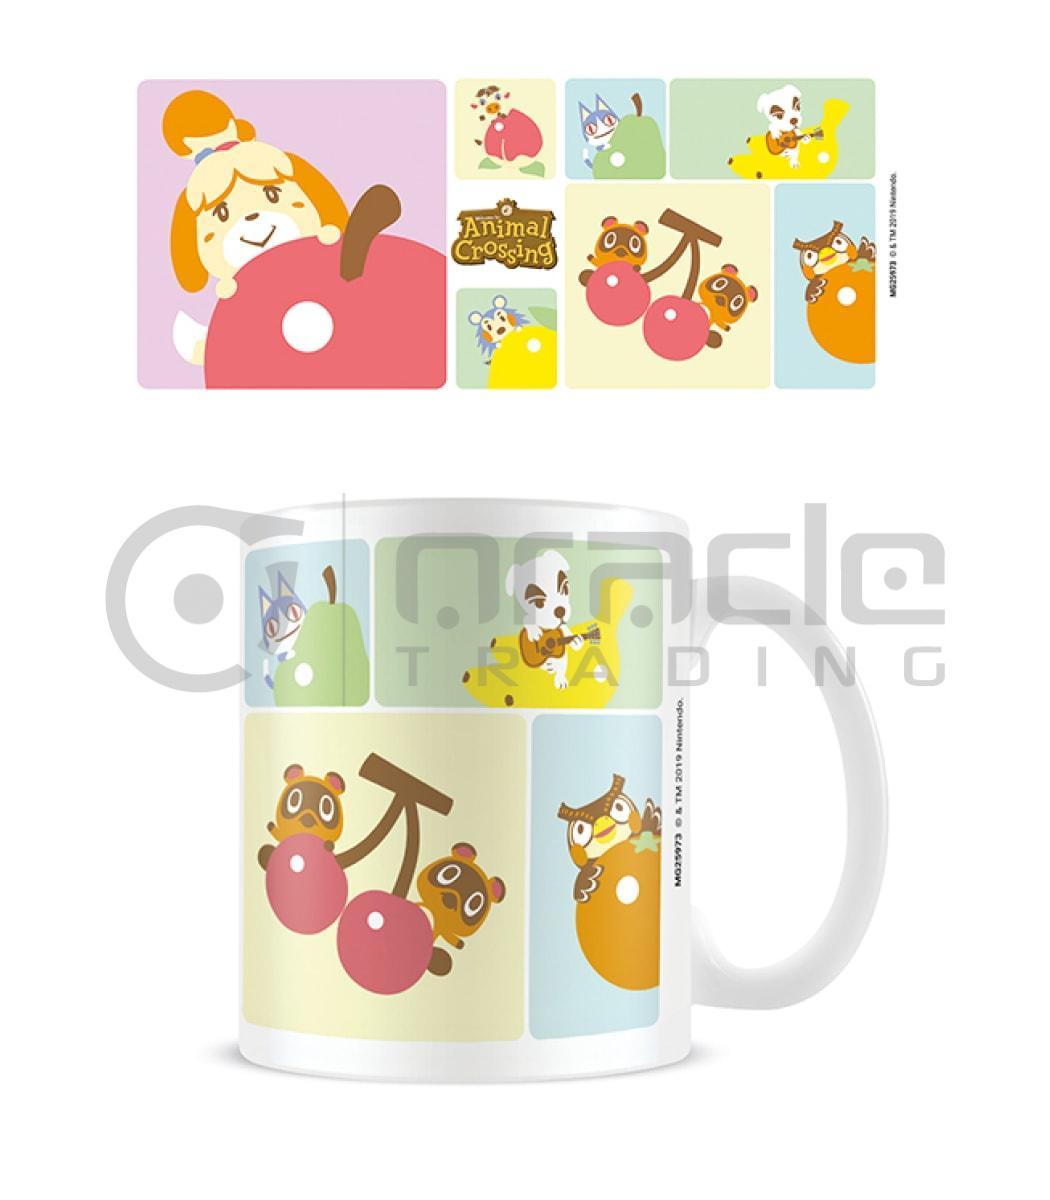 Animal Crossing Mug - Character Grid